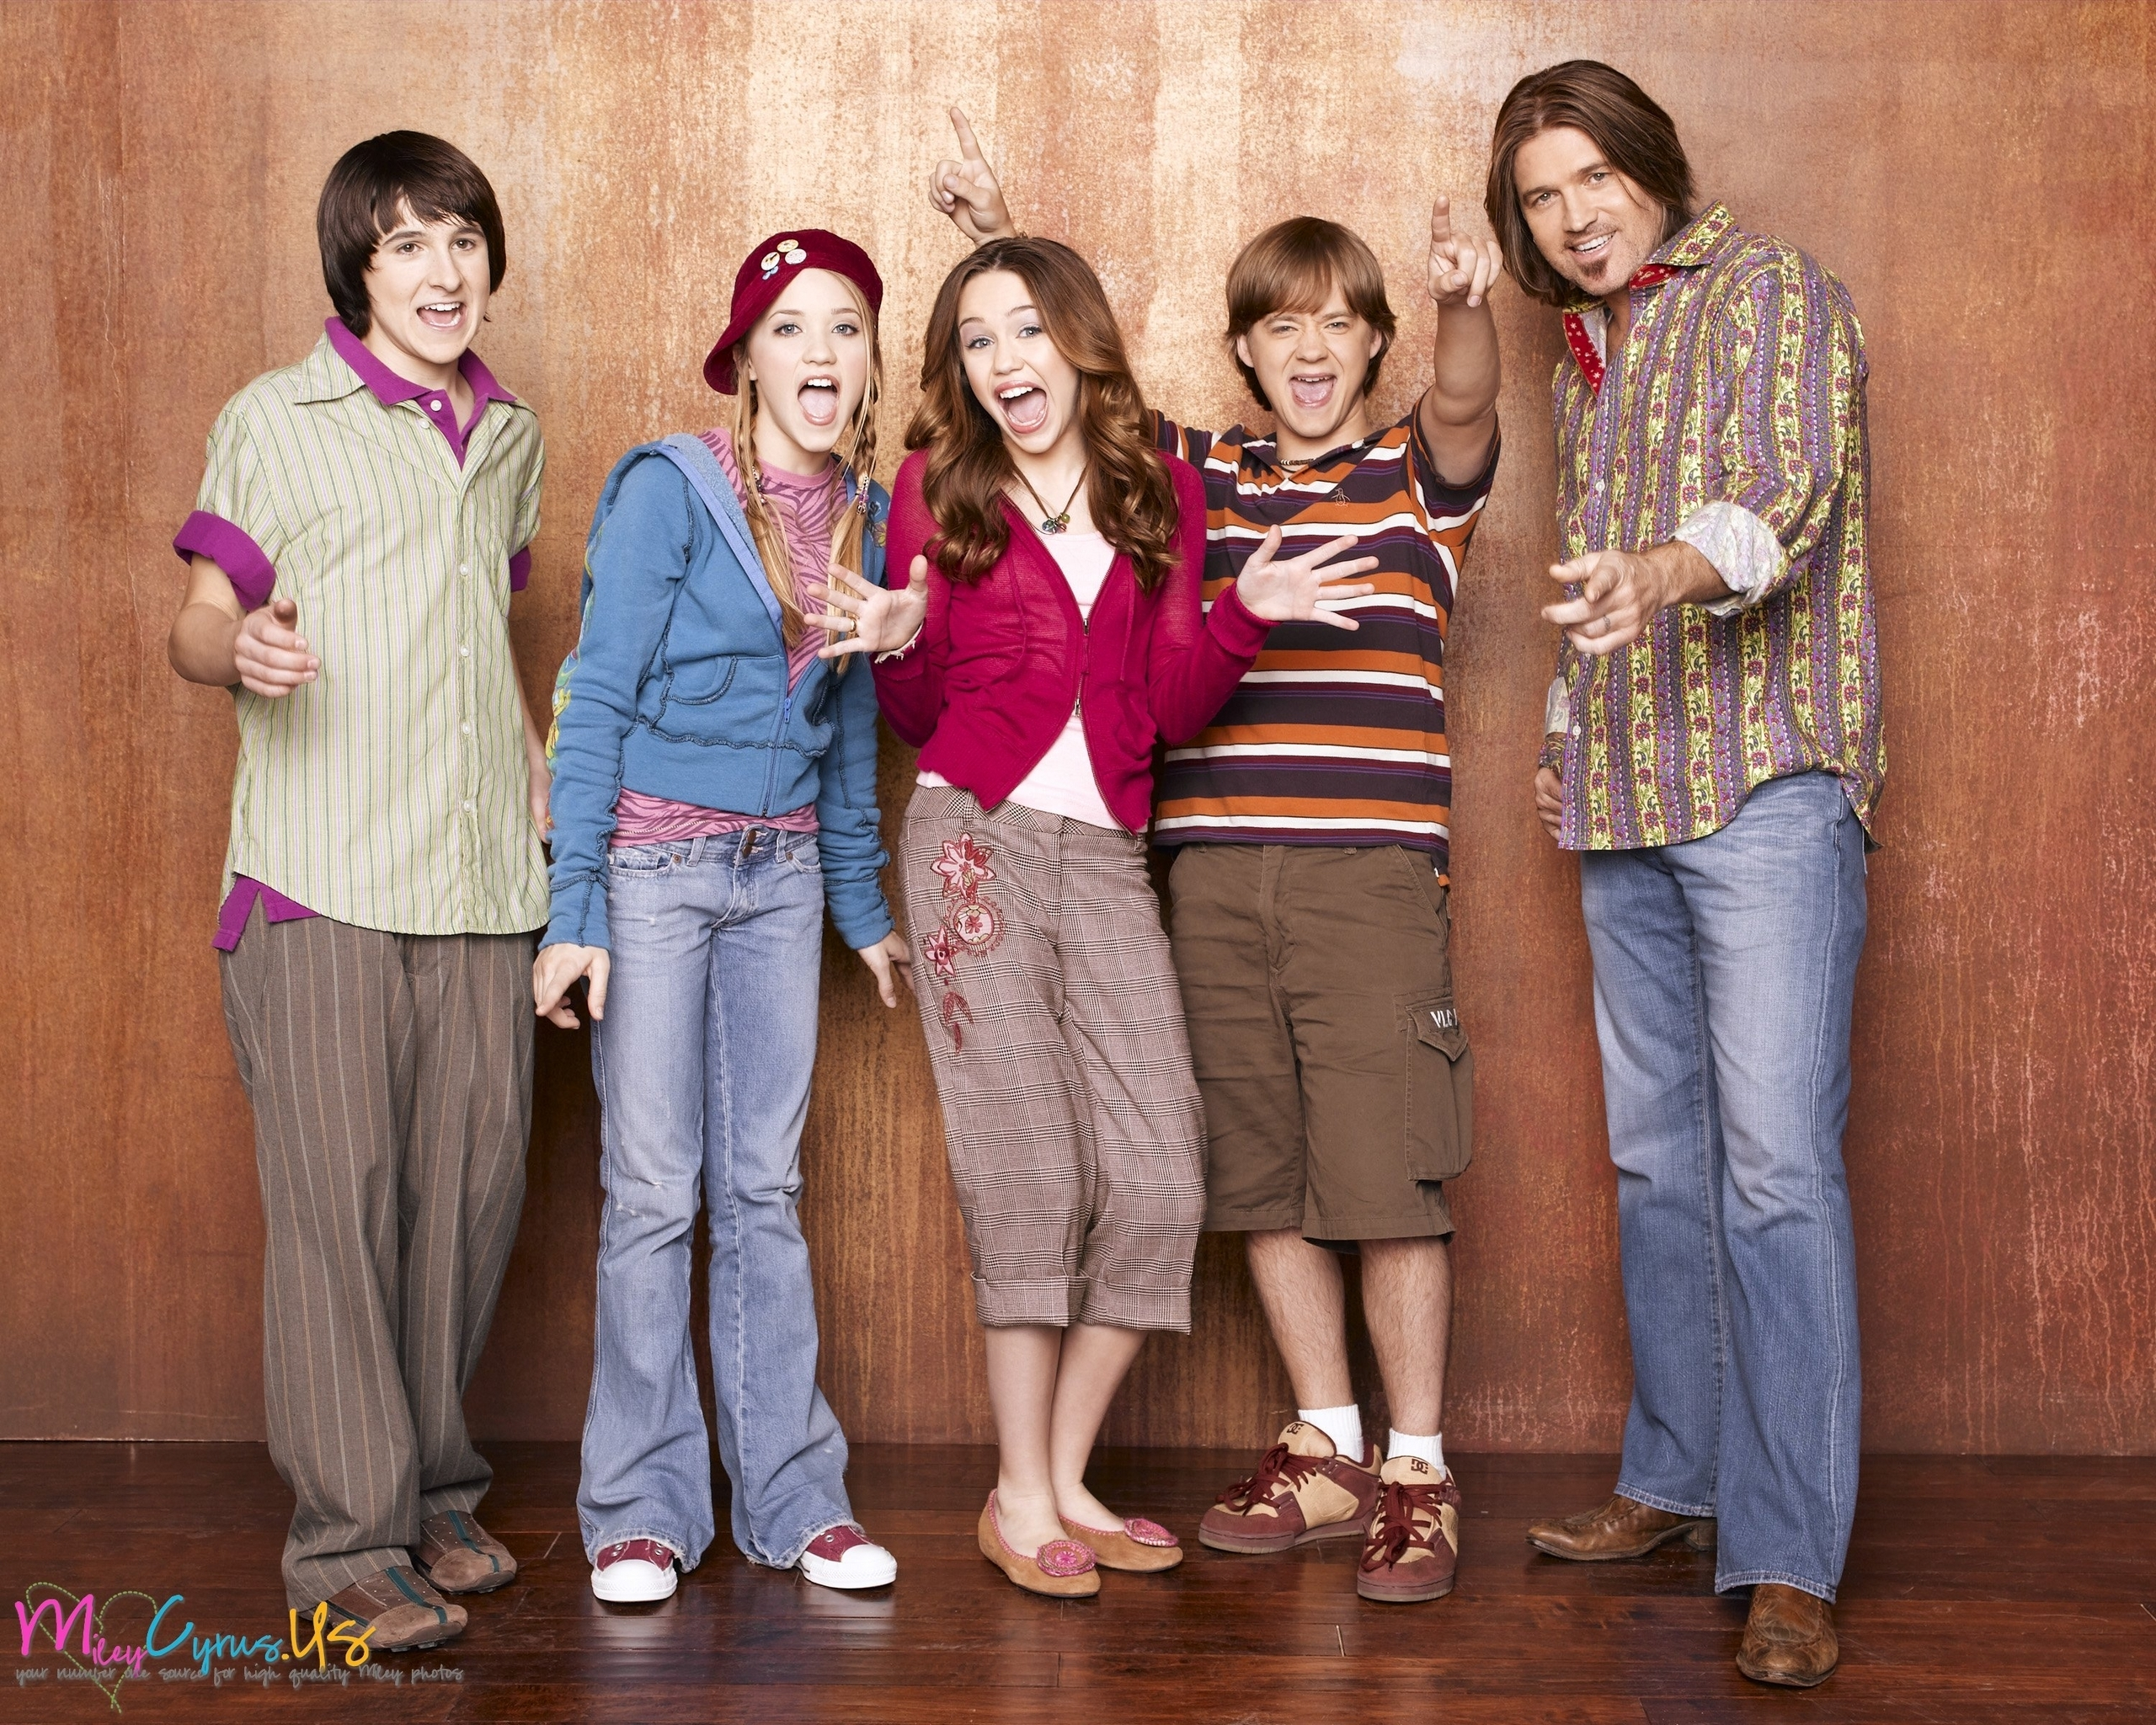 Miley Cyrus Hannah Montana Season 3 Miley Cyrus Hannah Montana